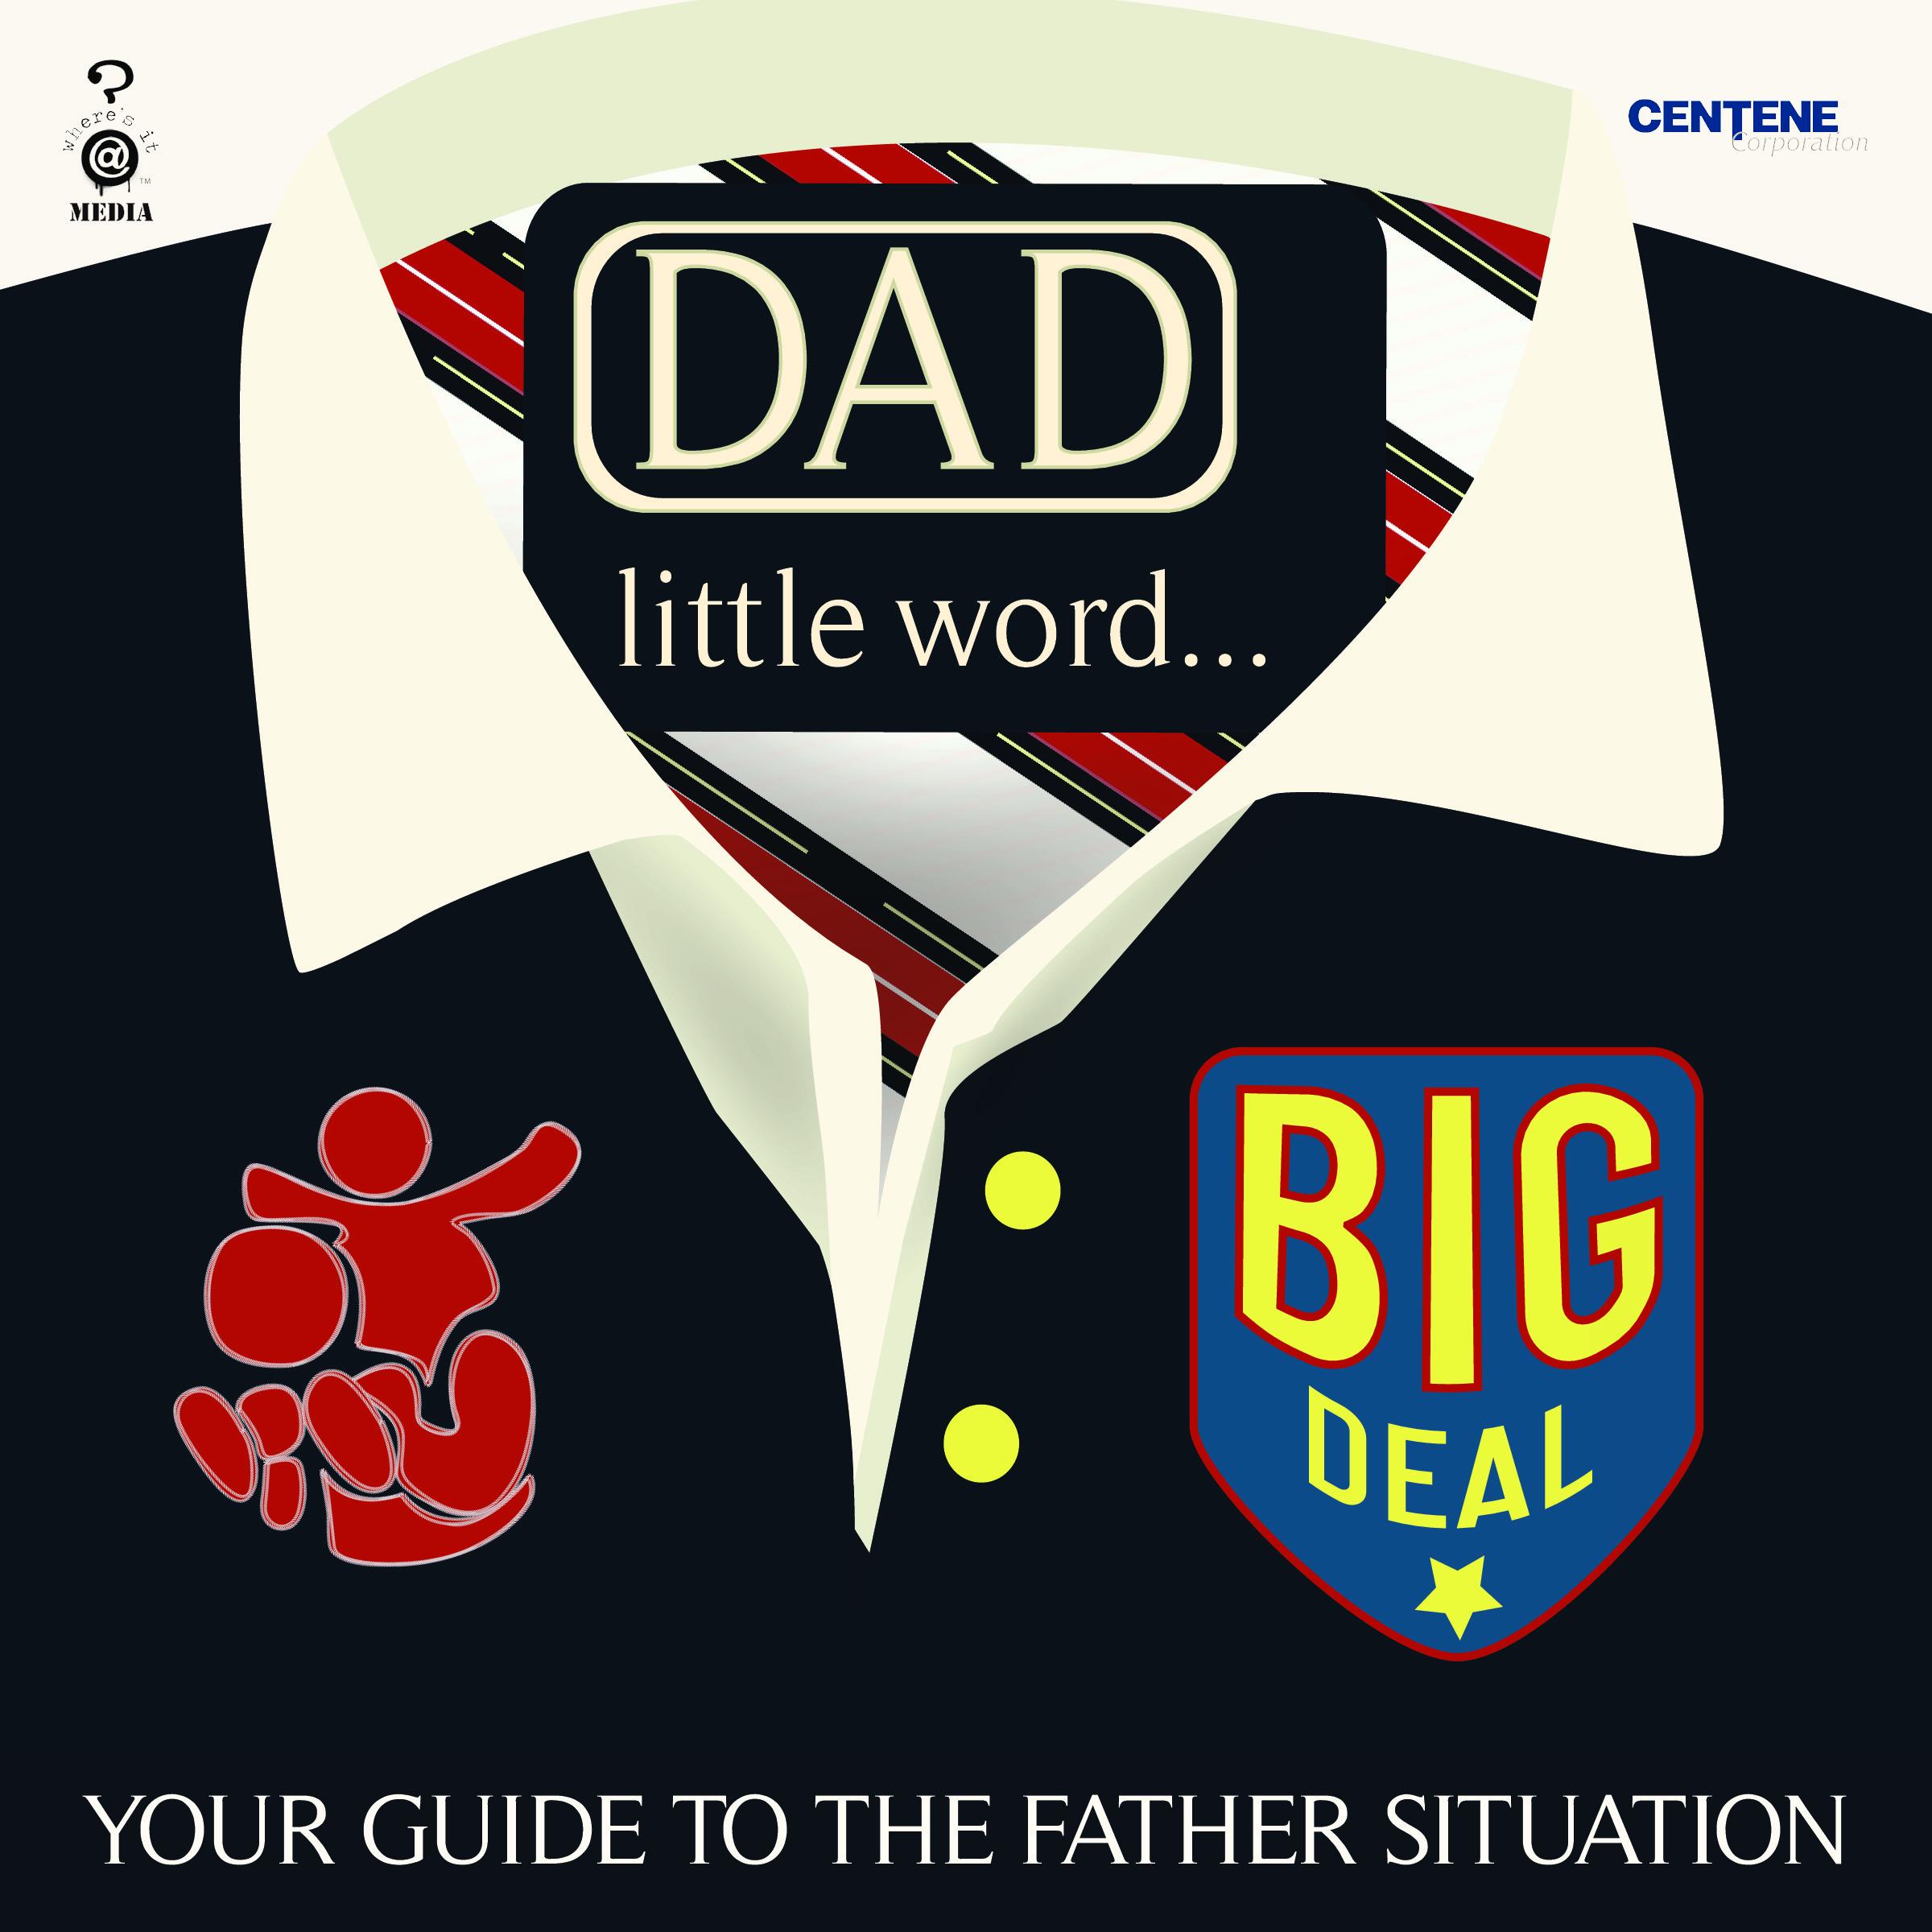 DAD: LITTLE WORD, BIG DEAL